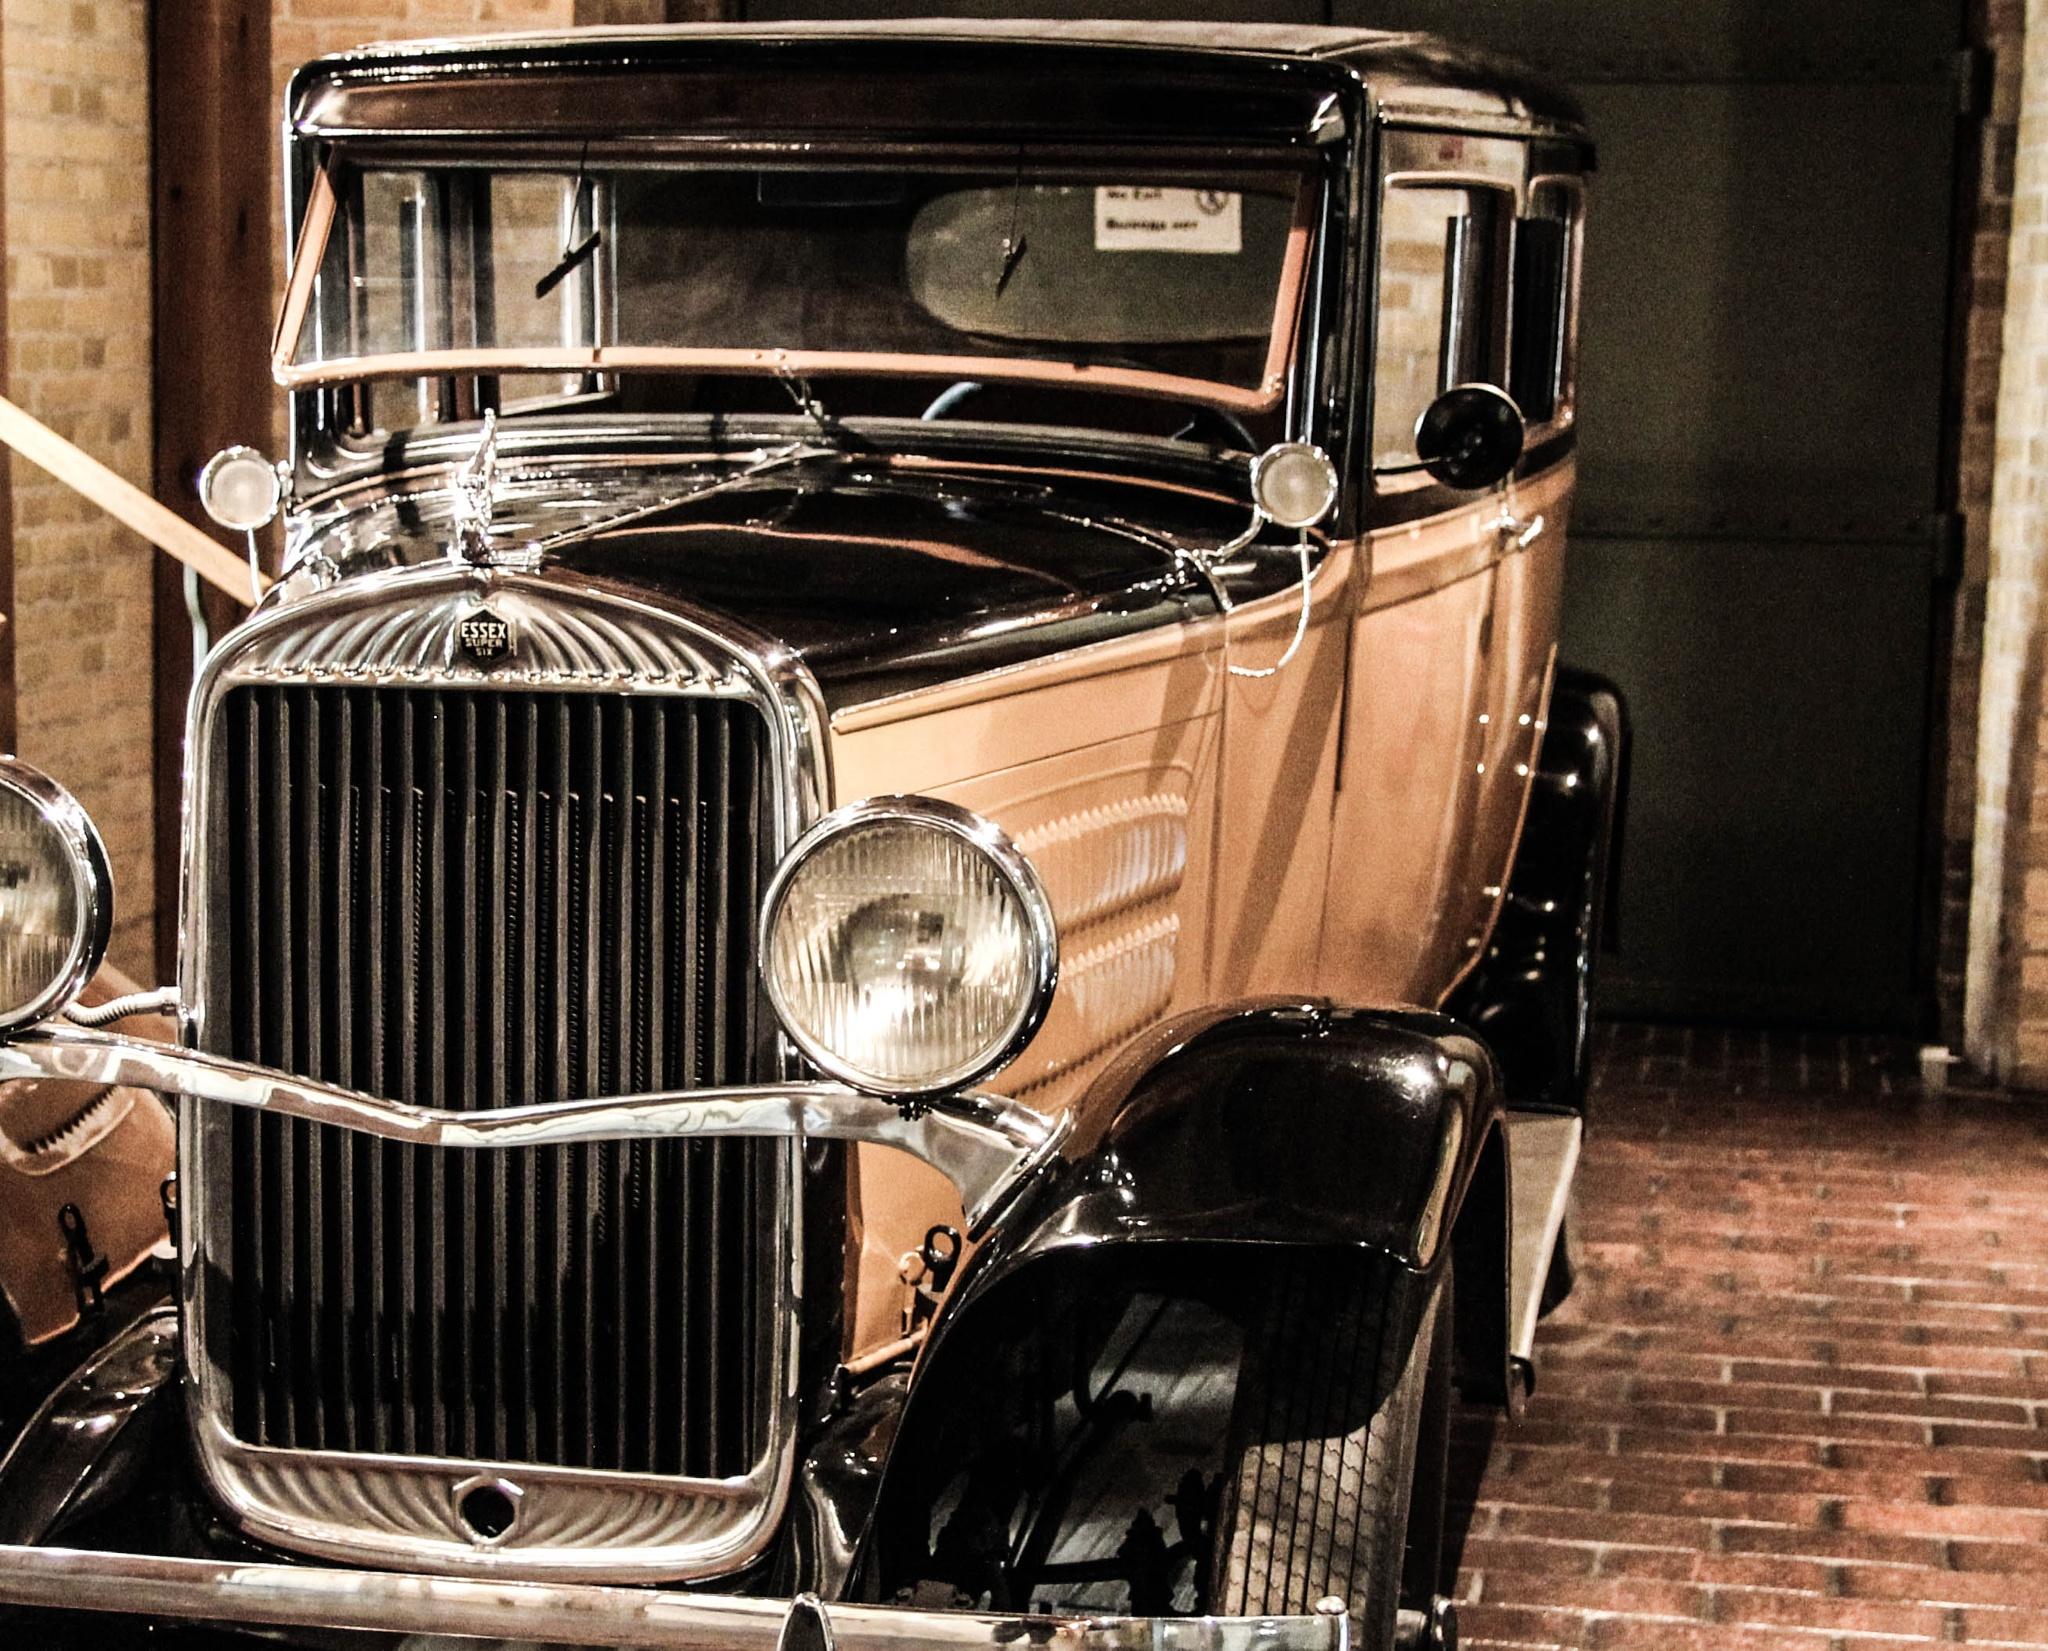 Vintage car by Dmitry Lev-ari